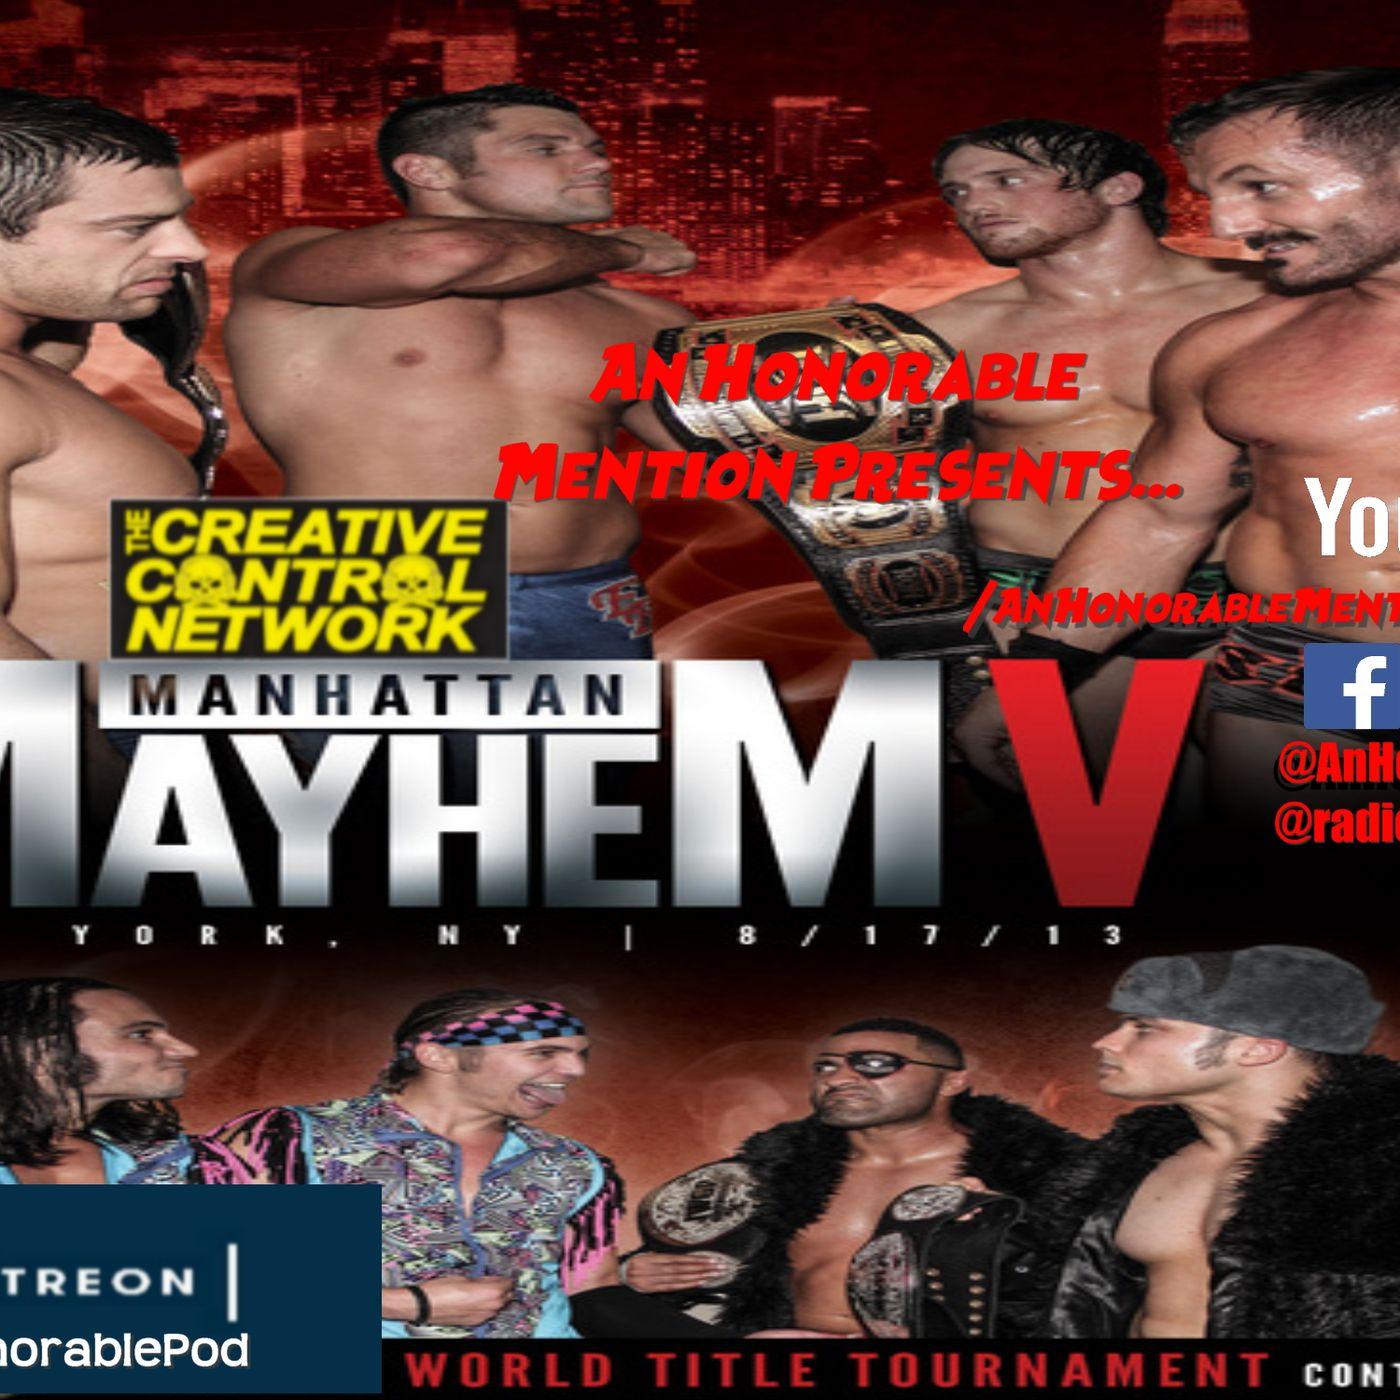 Episode 164: Manhattan Mayhem 5 (Presented by Patreon.com/AnHonorablePod)